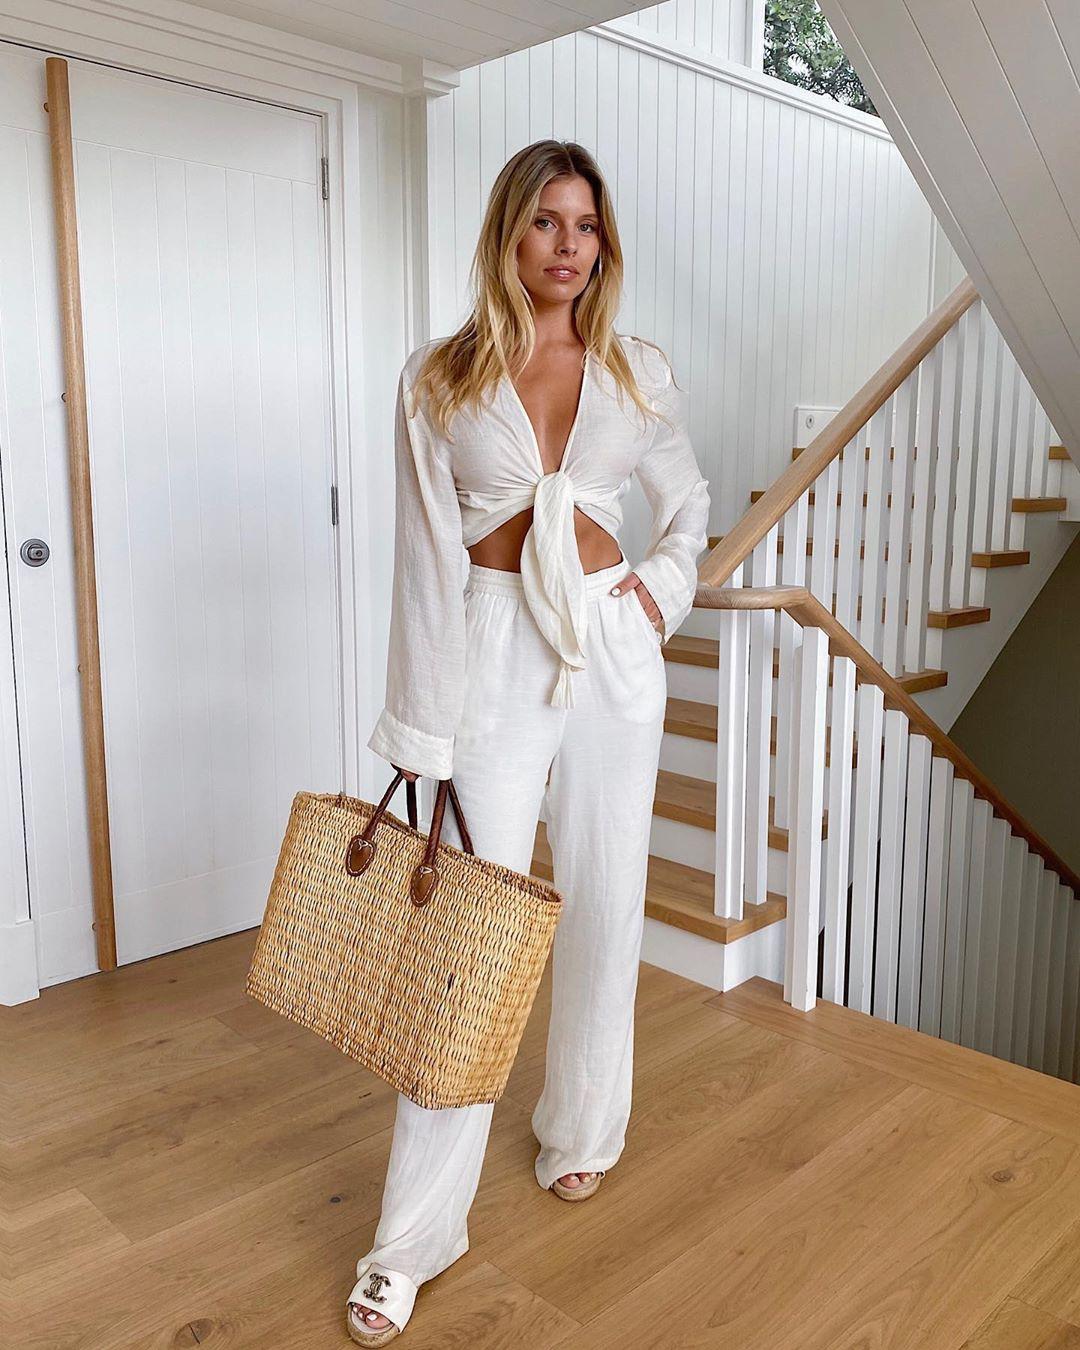 Natasha Oakley outfit designs, clothing, fashion